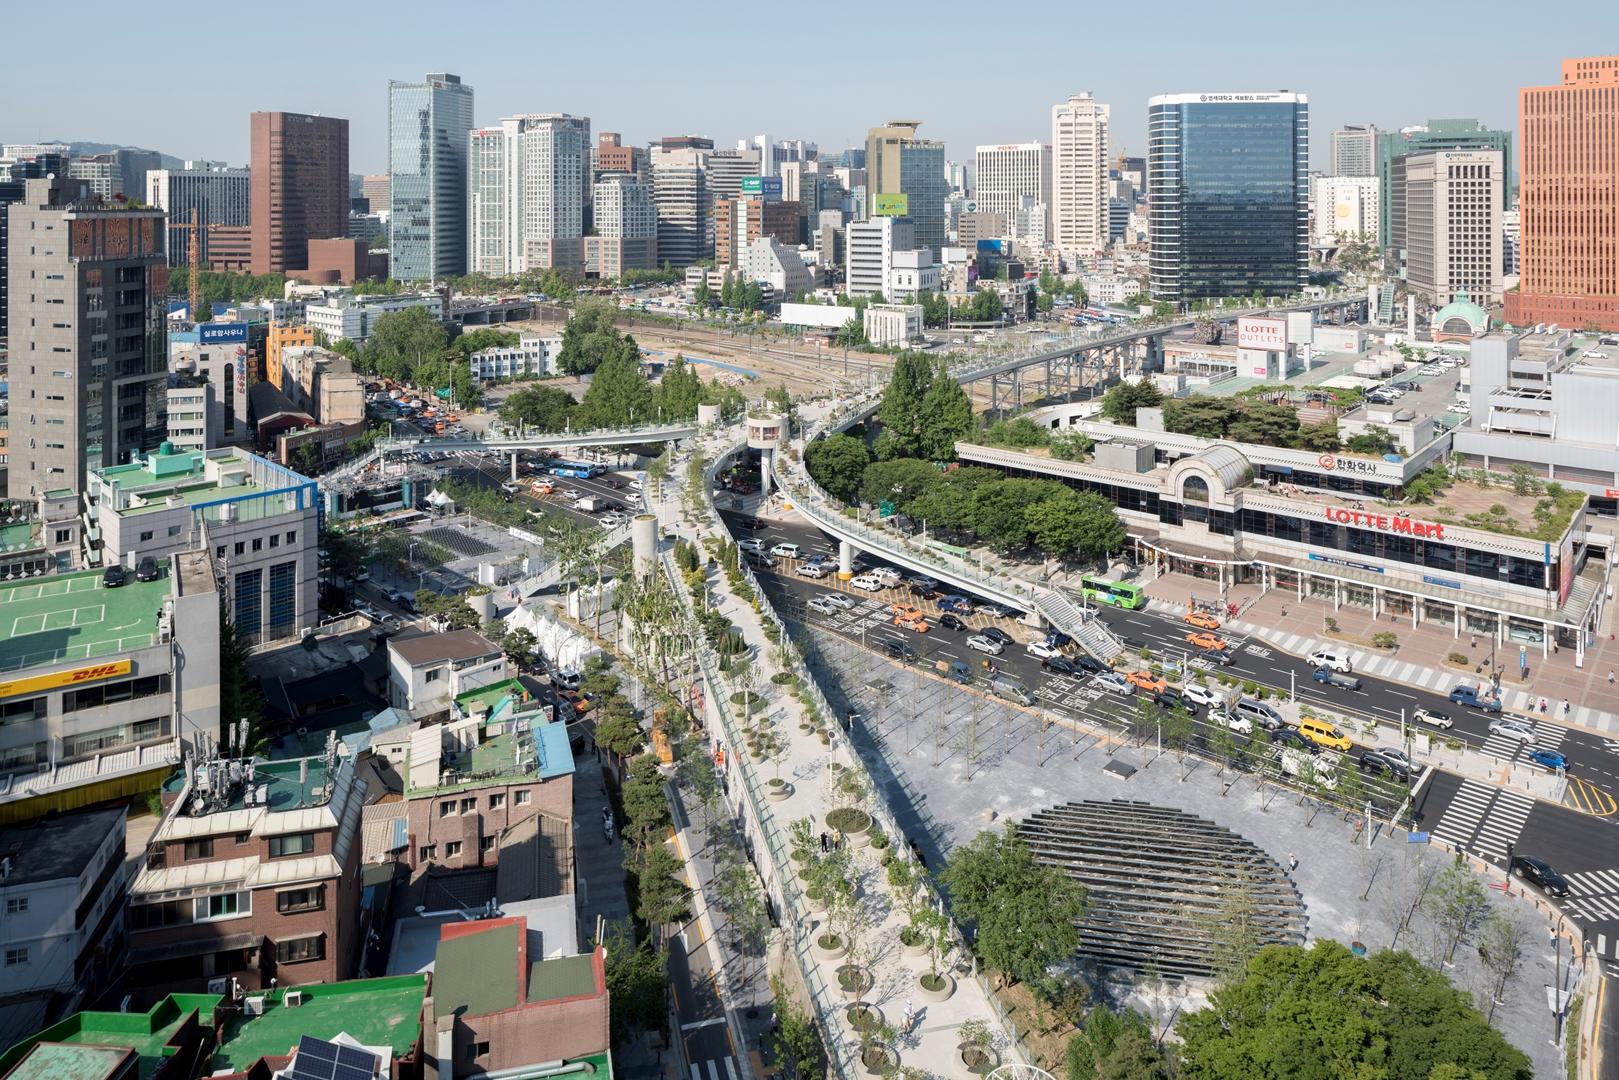 029_Skygarden_Seoul_©Ossip (Copy)